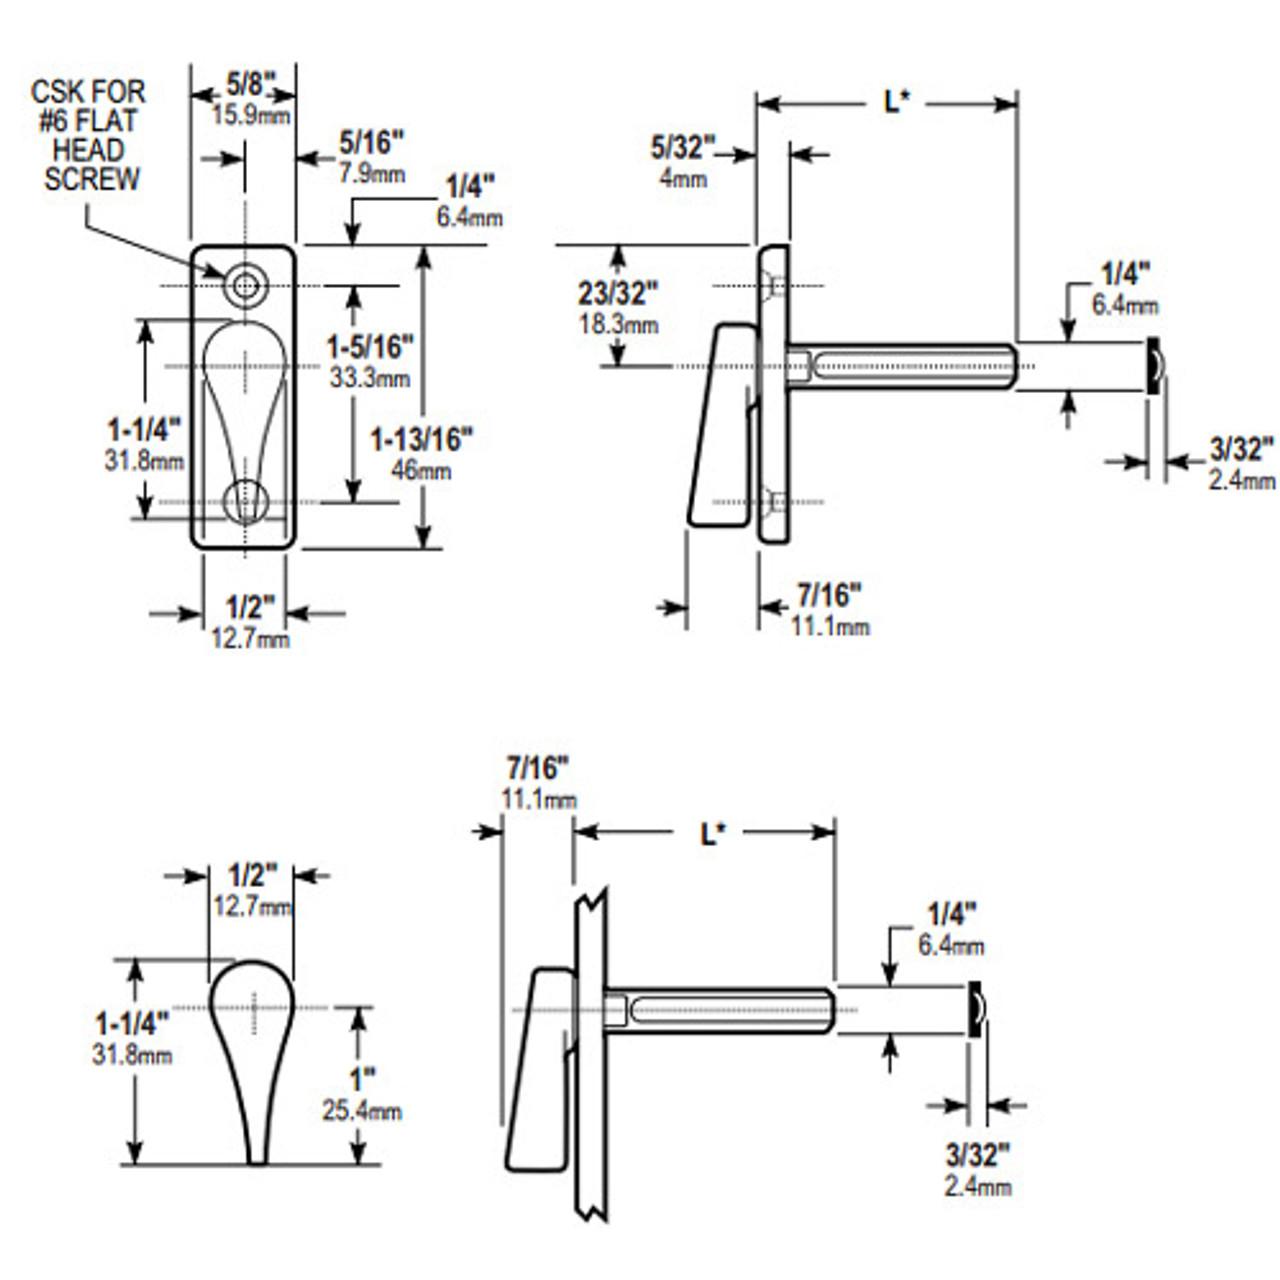 1000-11-23-121 Adams Rite 1000 Series Turns Dimensional View